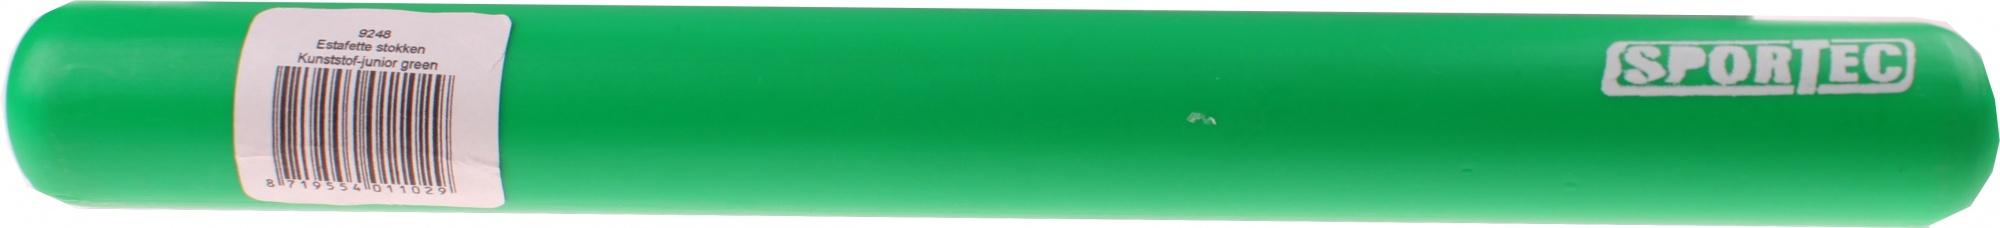 sportec estafettestok 29,5 cm kunststof groen internet sport\u0026casualsKunststof Estafette Stokken #14